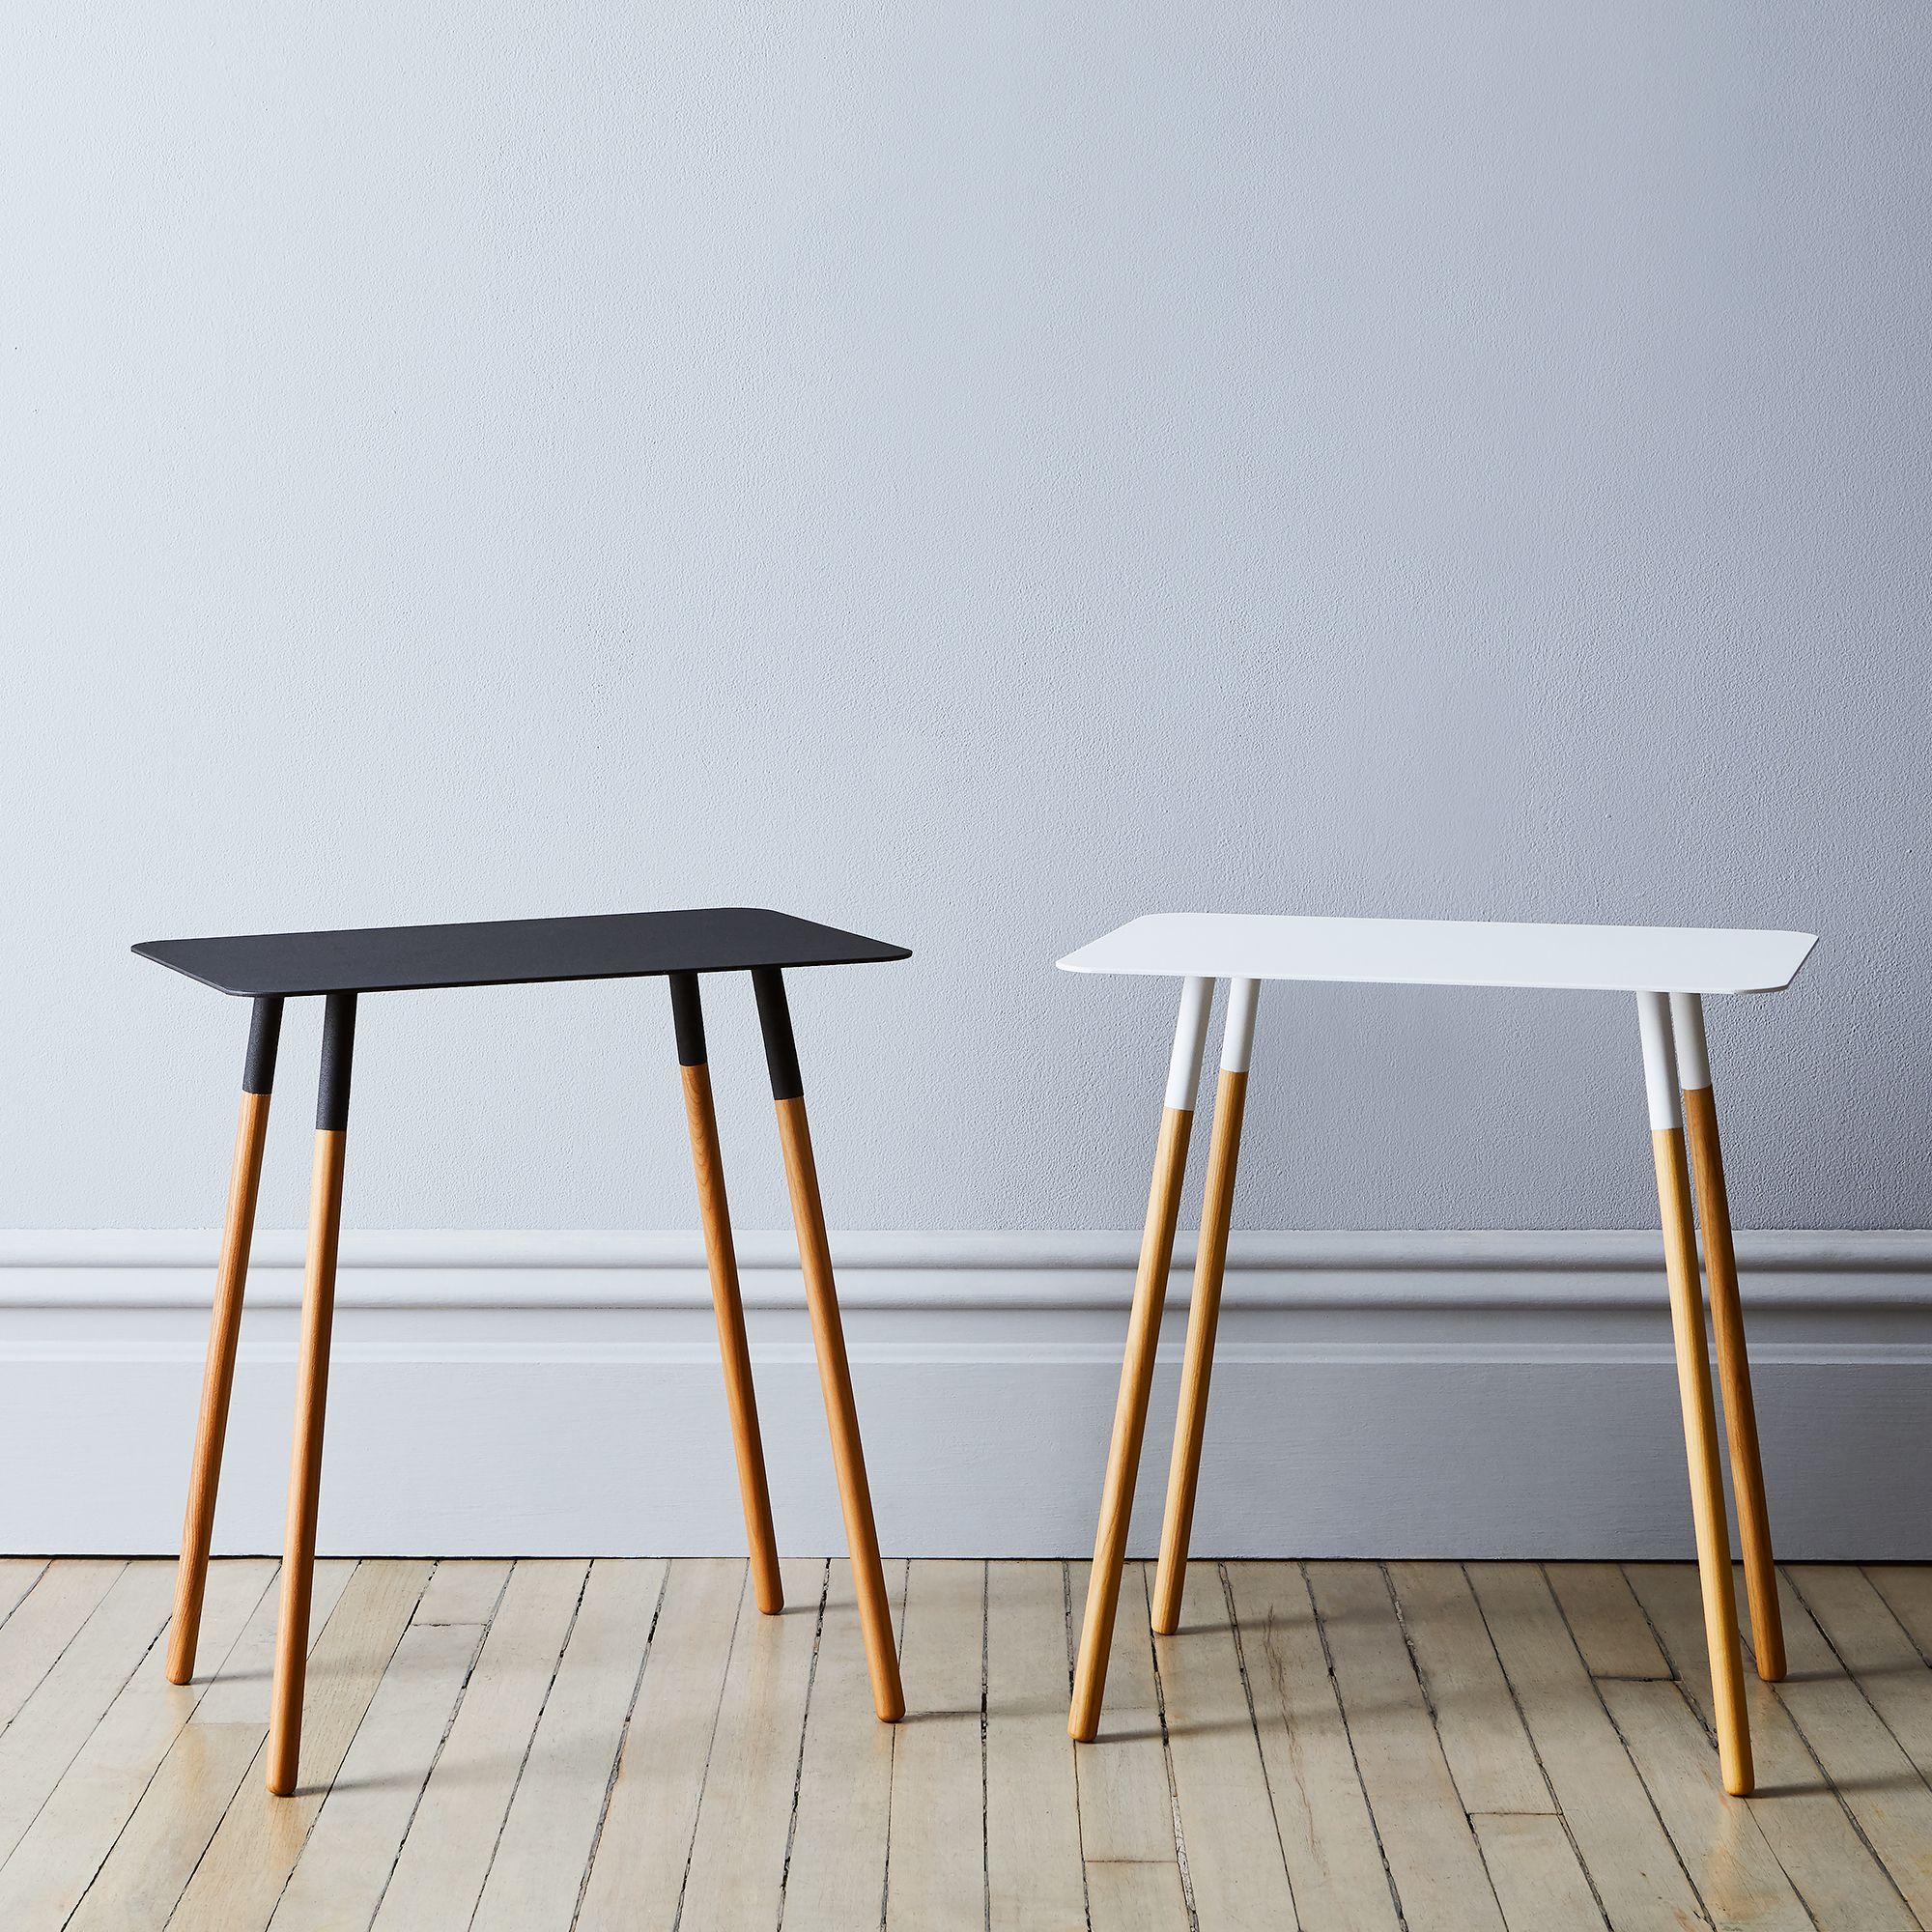 Steel Amp Wood Rectangular Side Table In 2019 Lovely Home